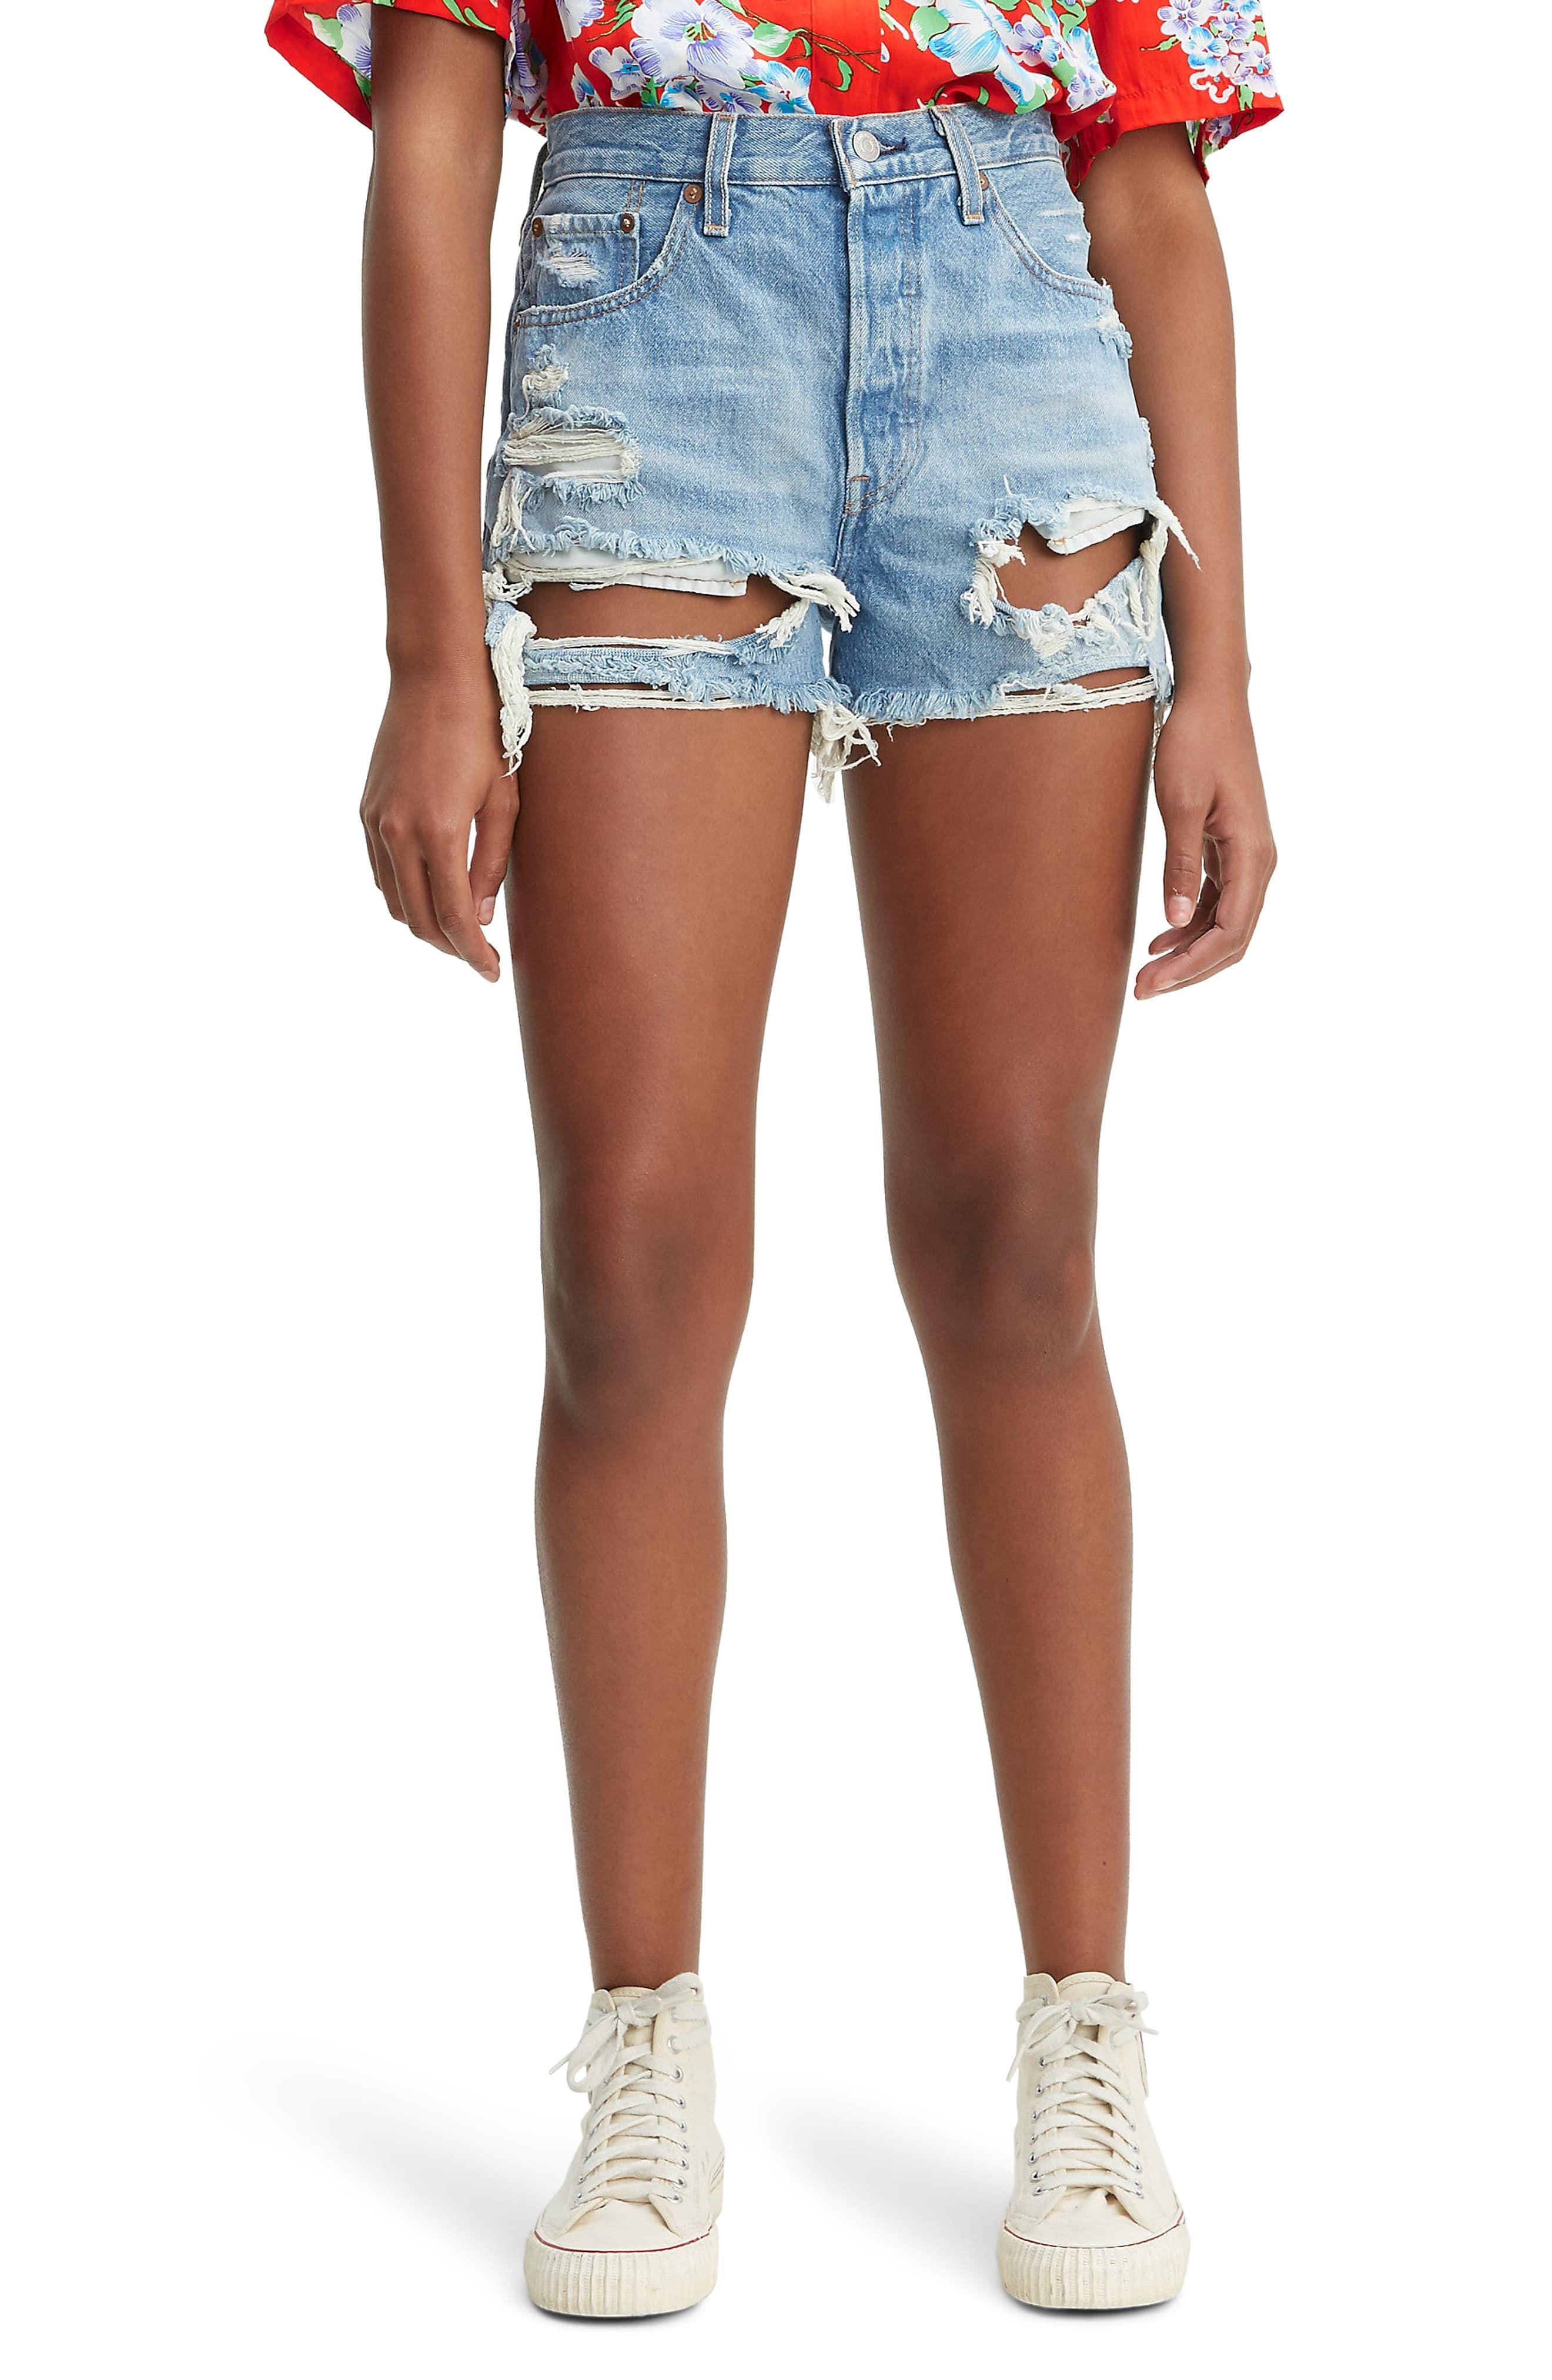 26 High Waisted Distressed Denim Shorts